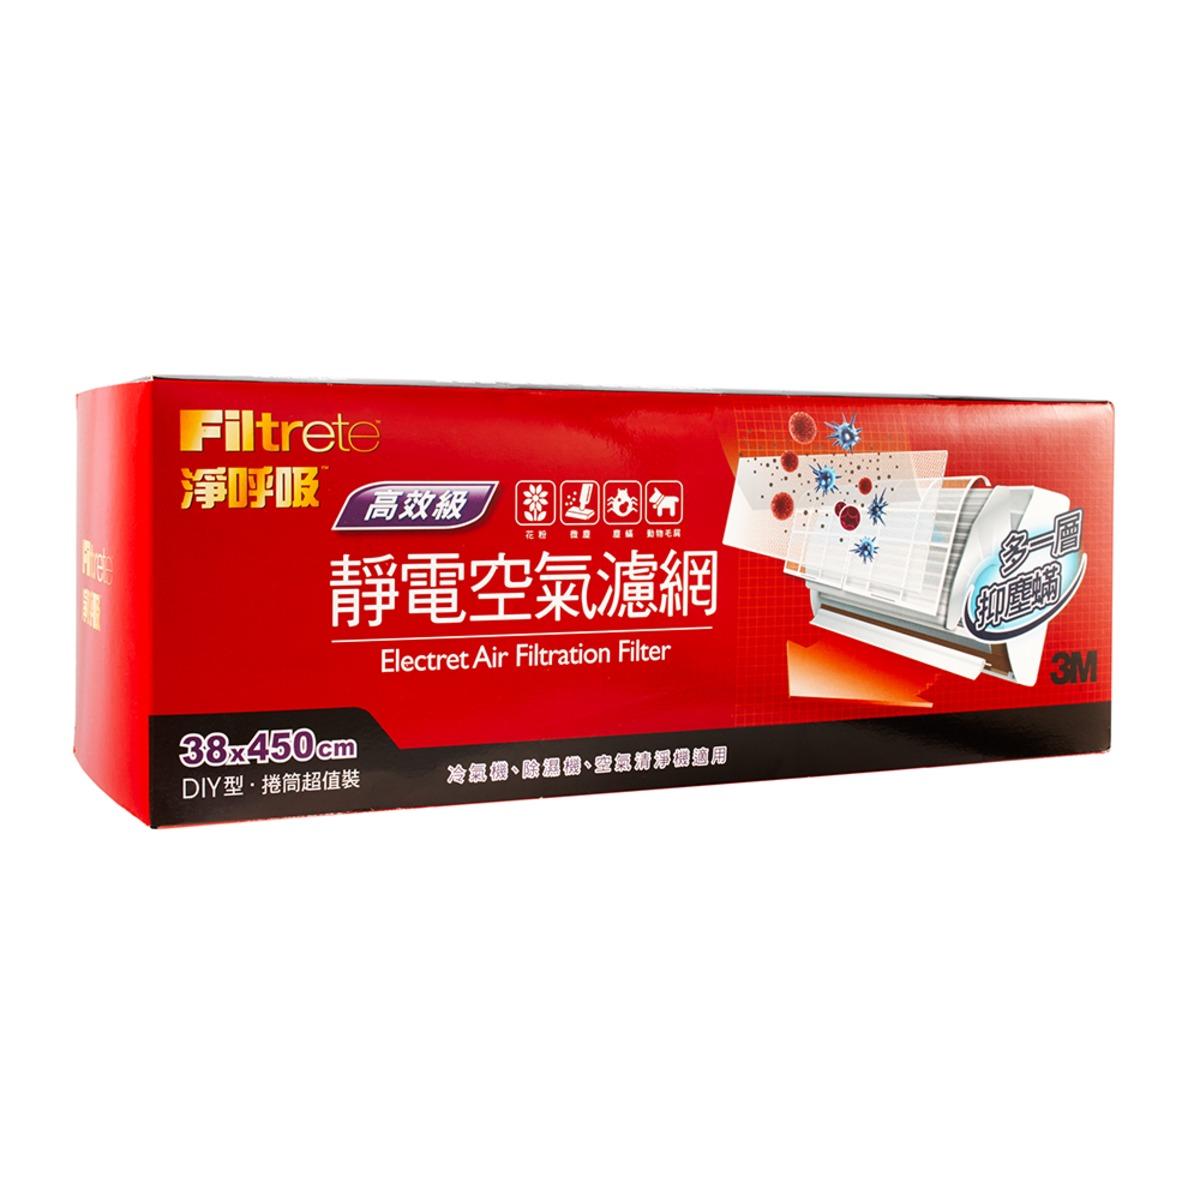 3M高效級捲筒式靜電空氣濾網